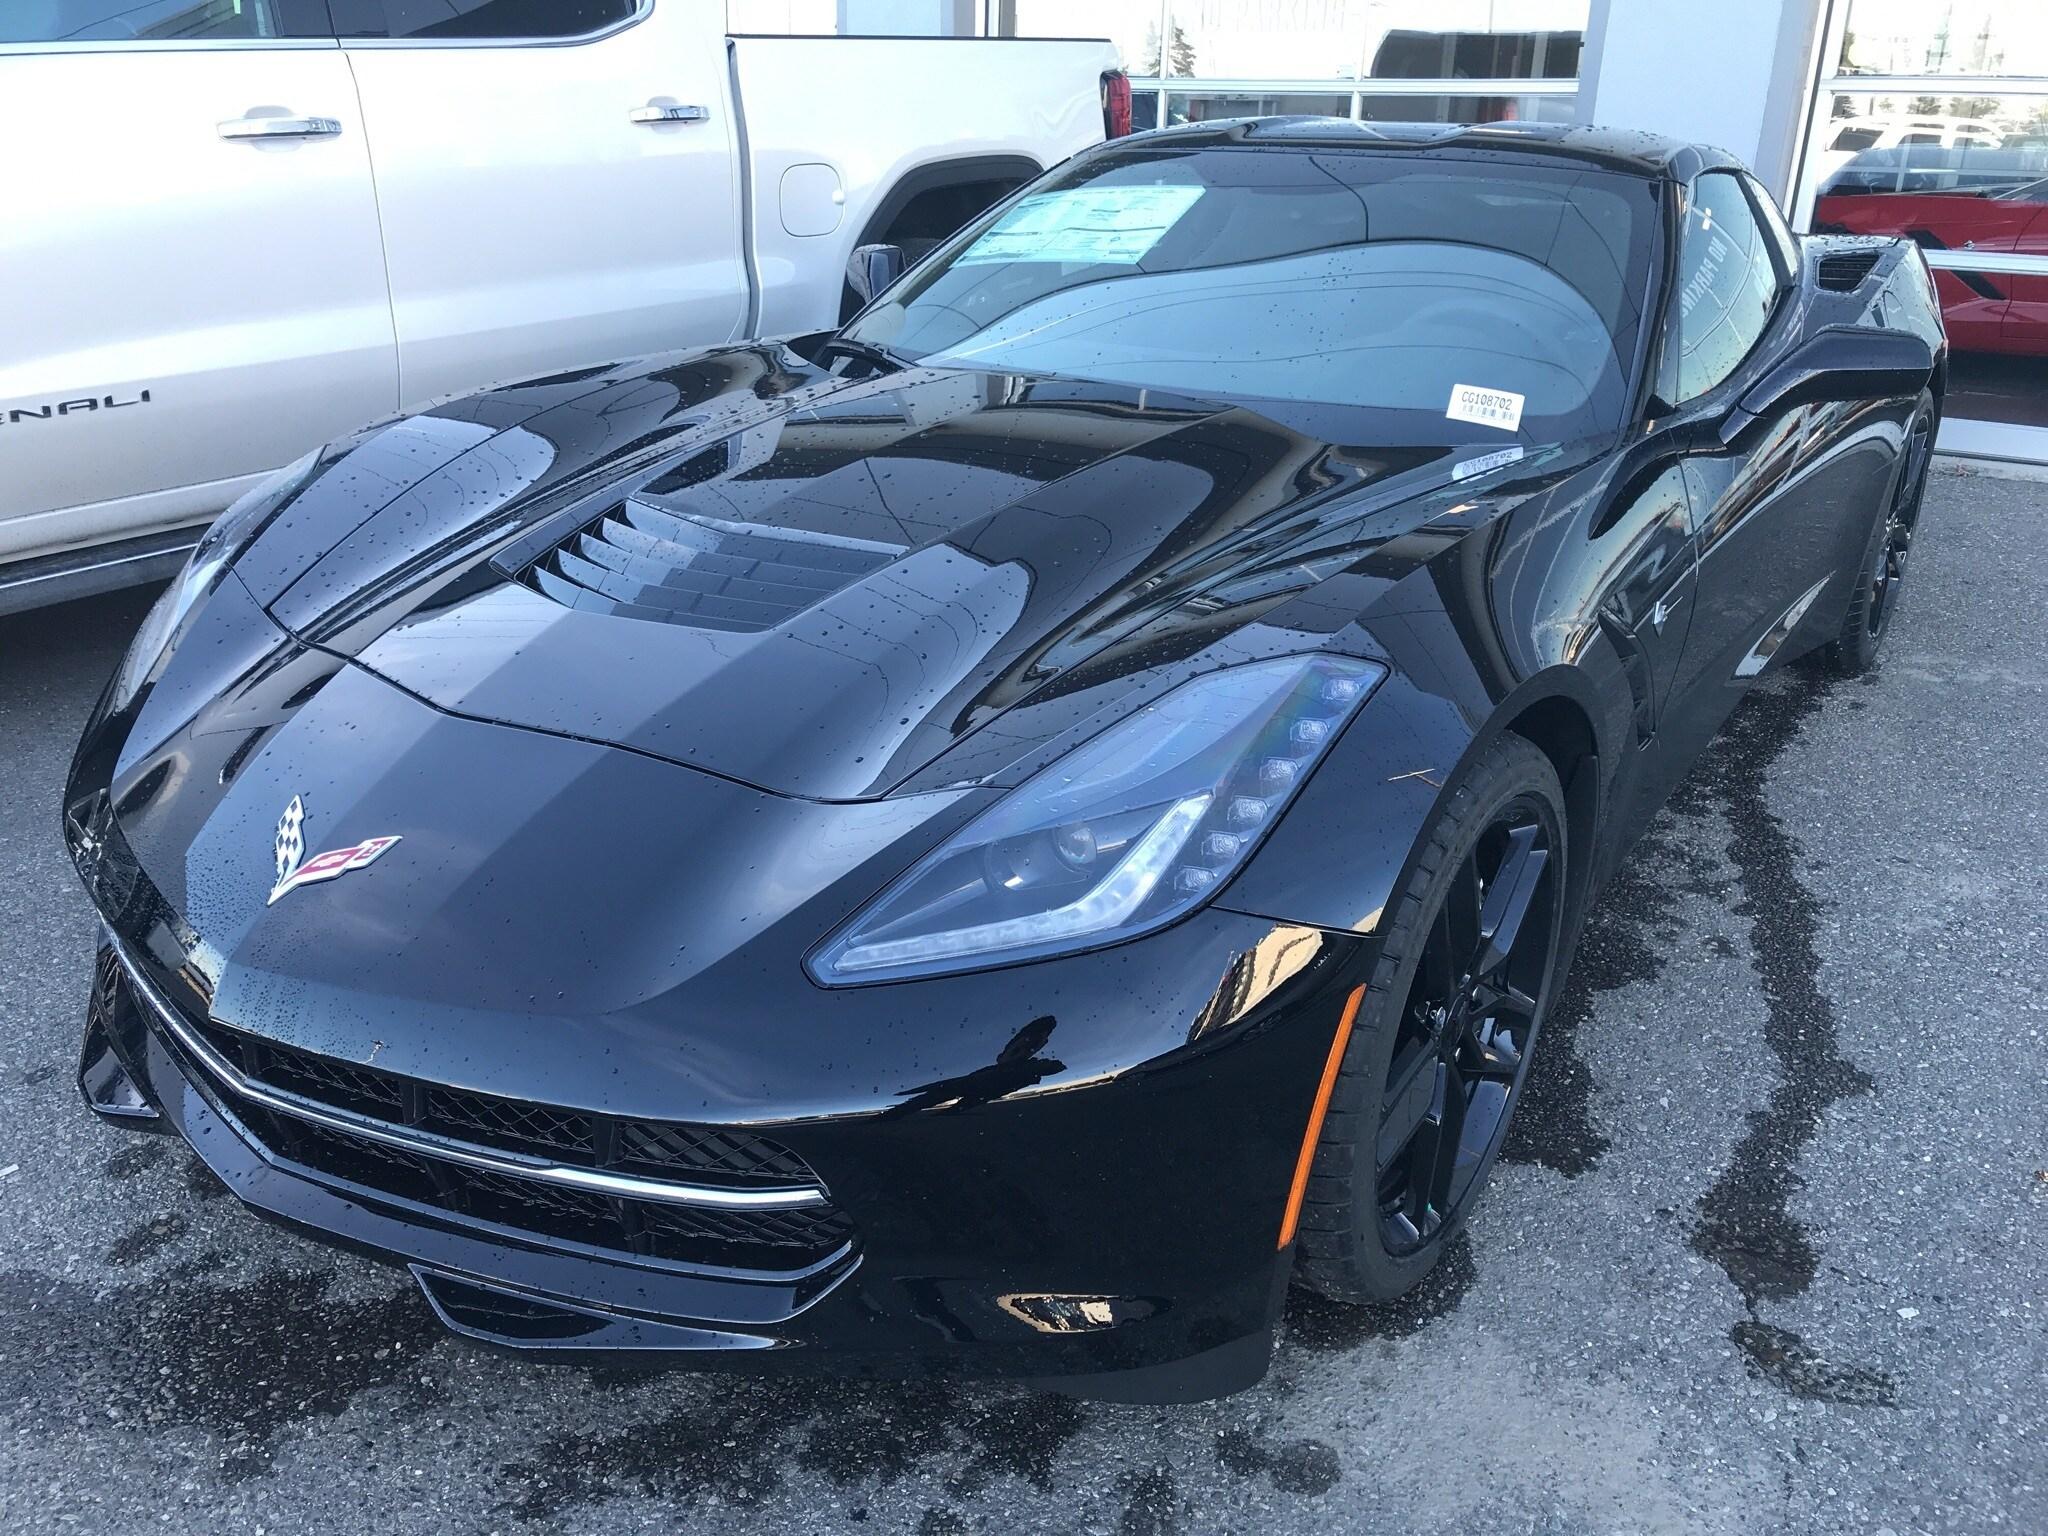 Cadillac peugeot corvette